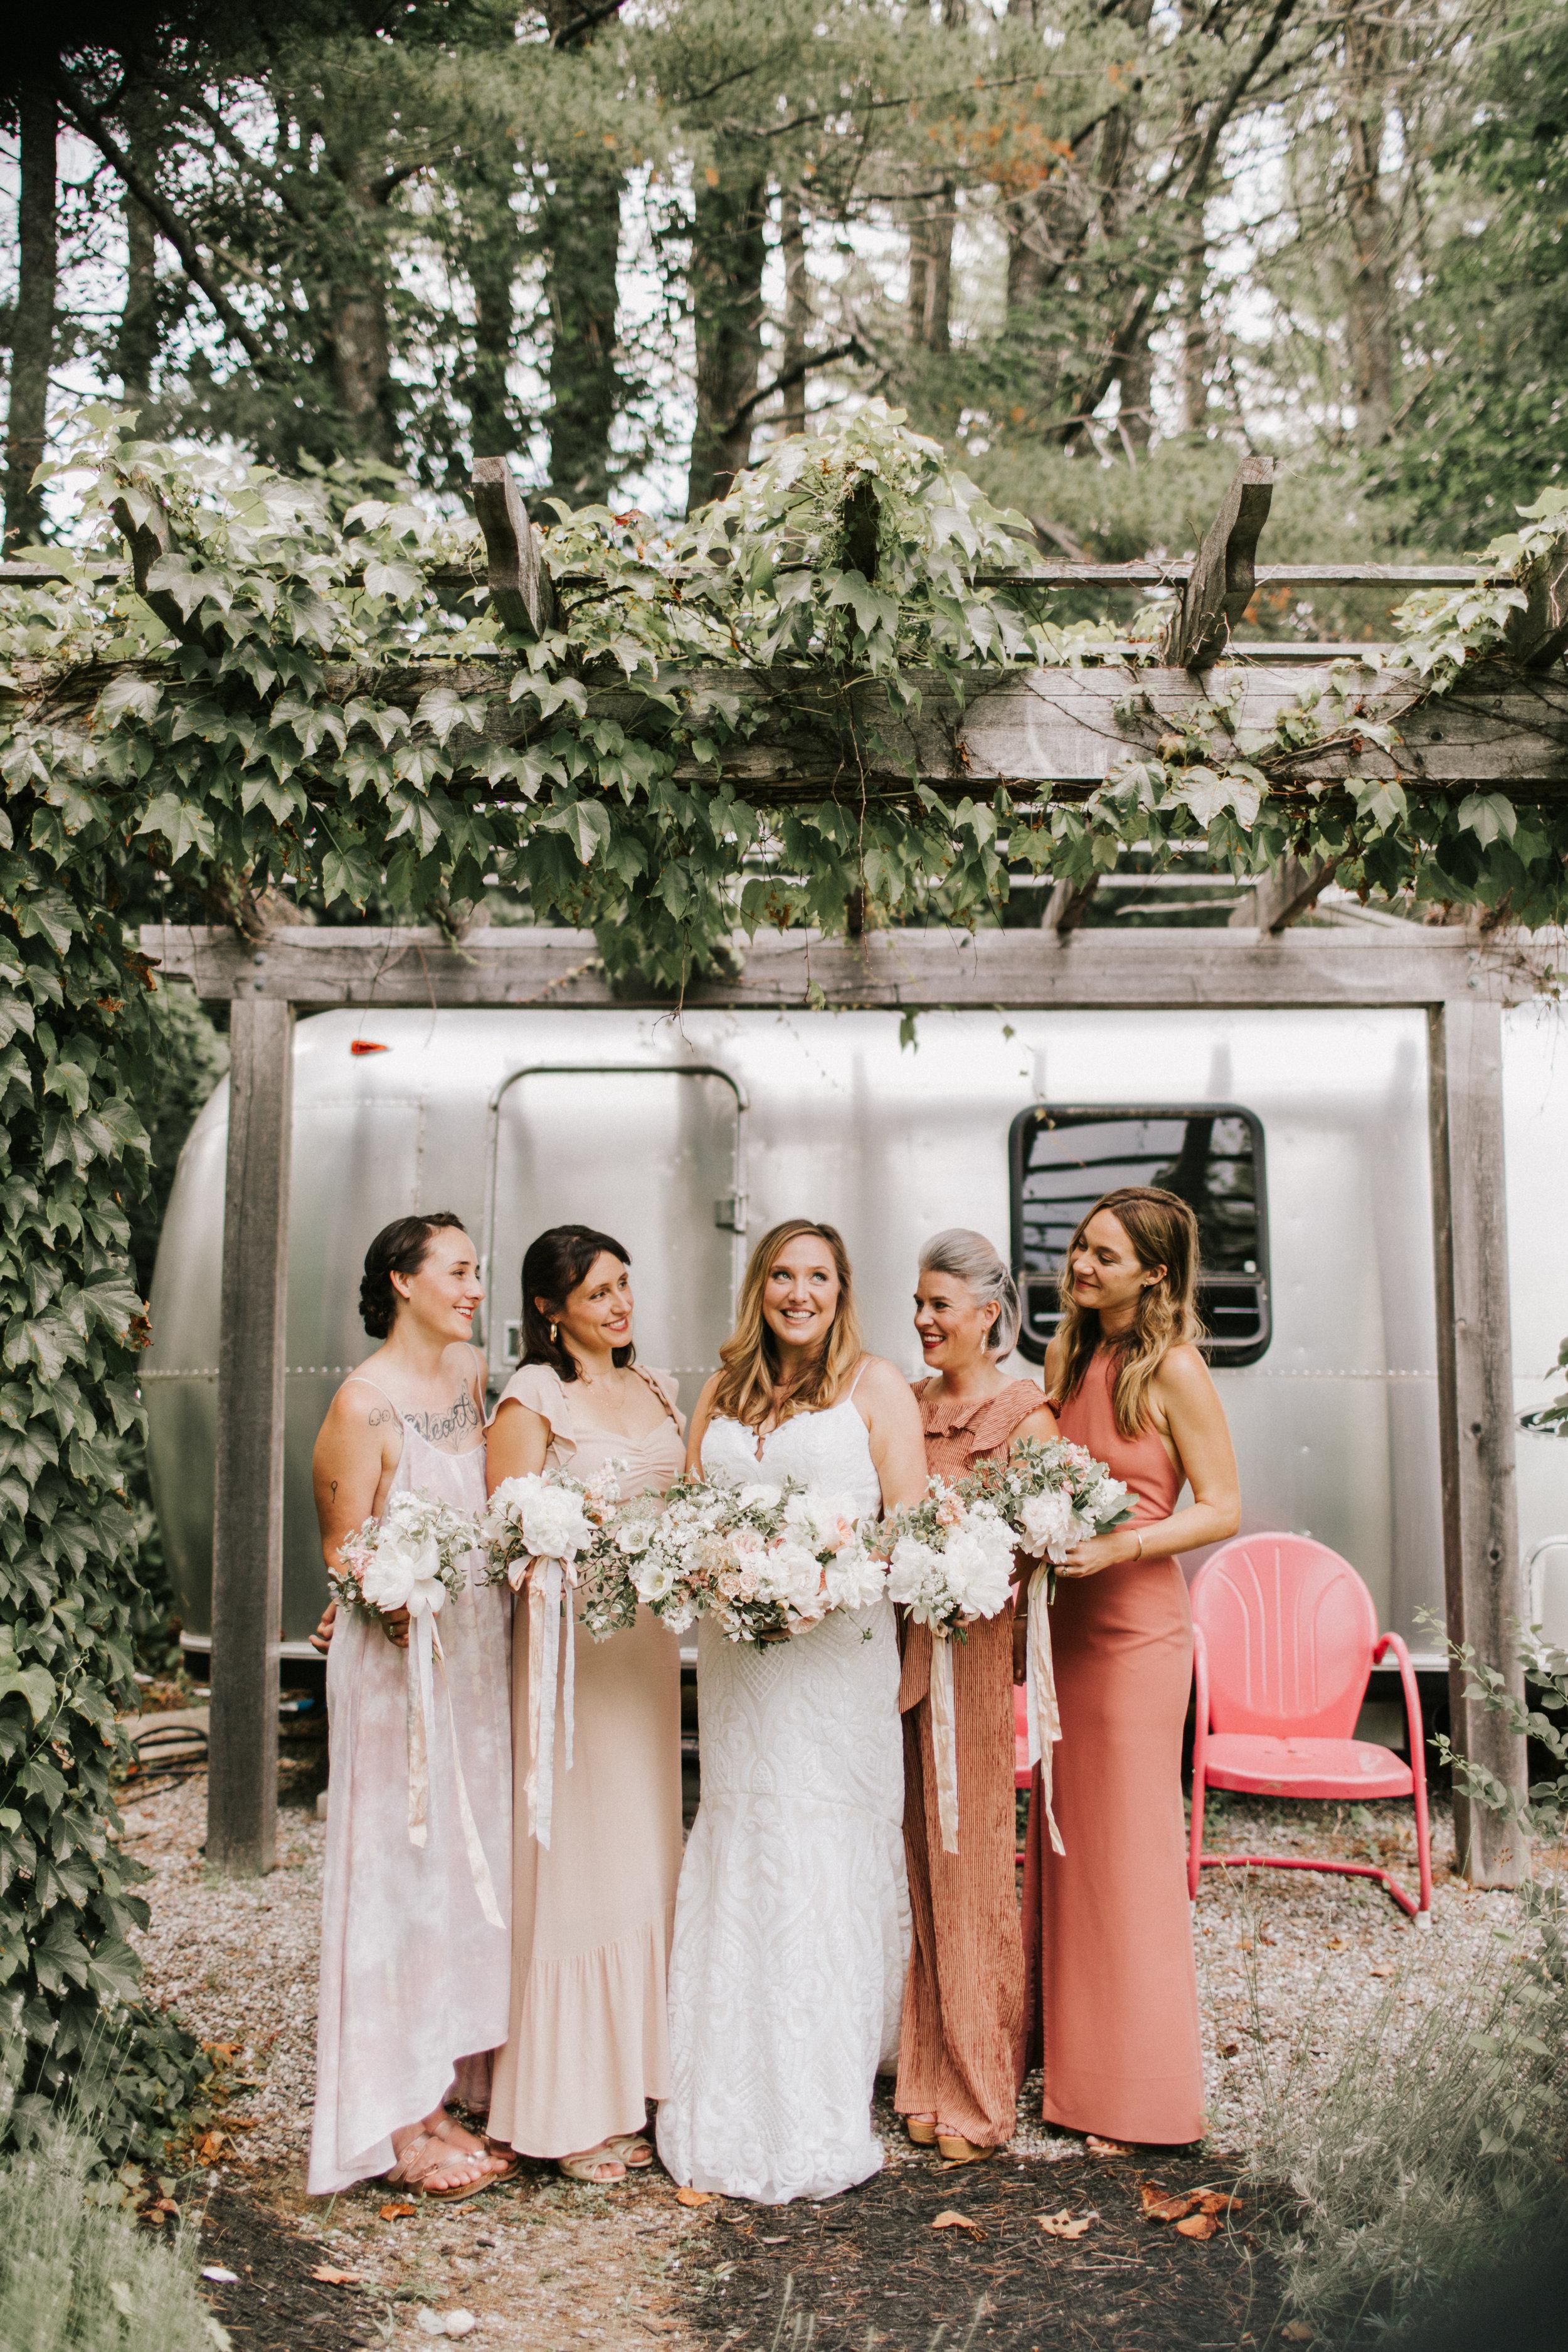 Watershed_Floral_Marianmade_Farm_Wedding_JamieMercurioPhoto2018-139.jpg